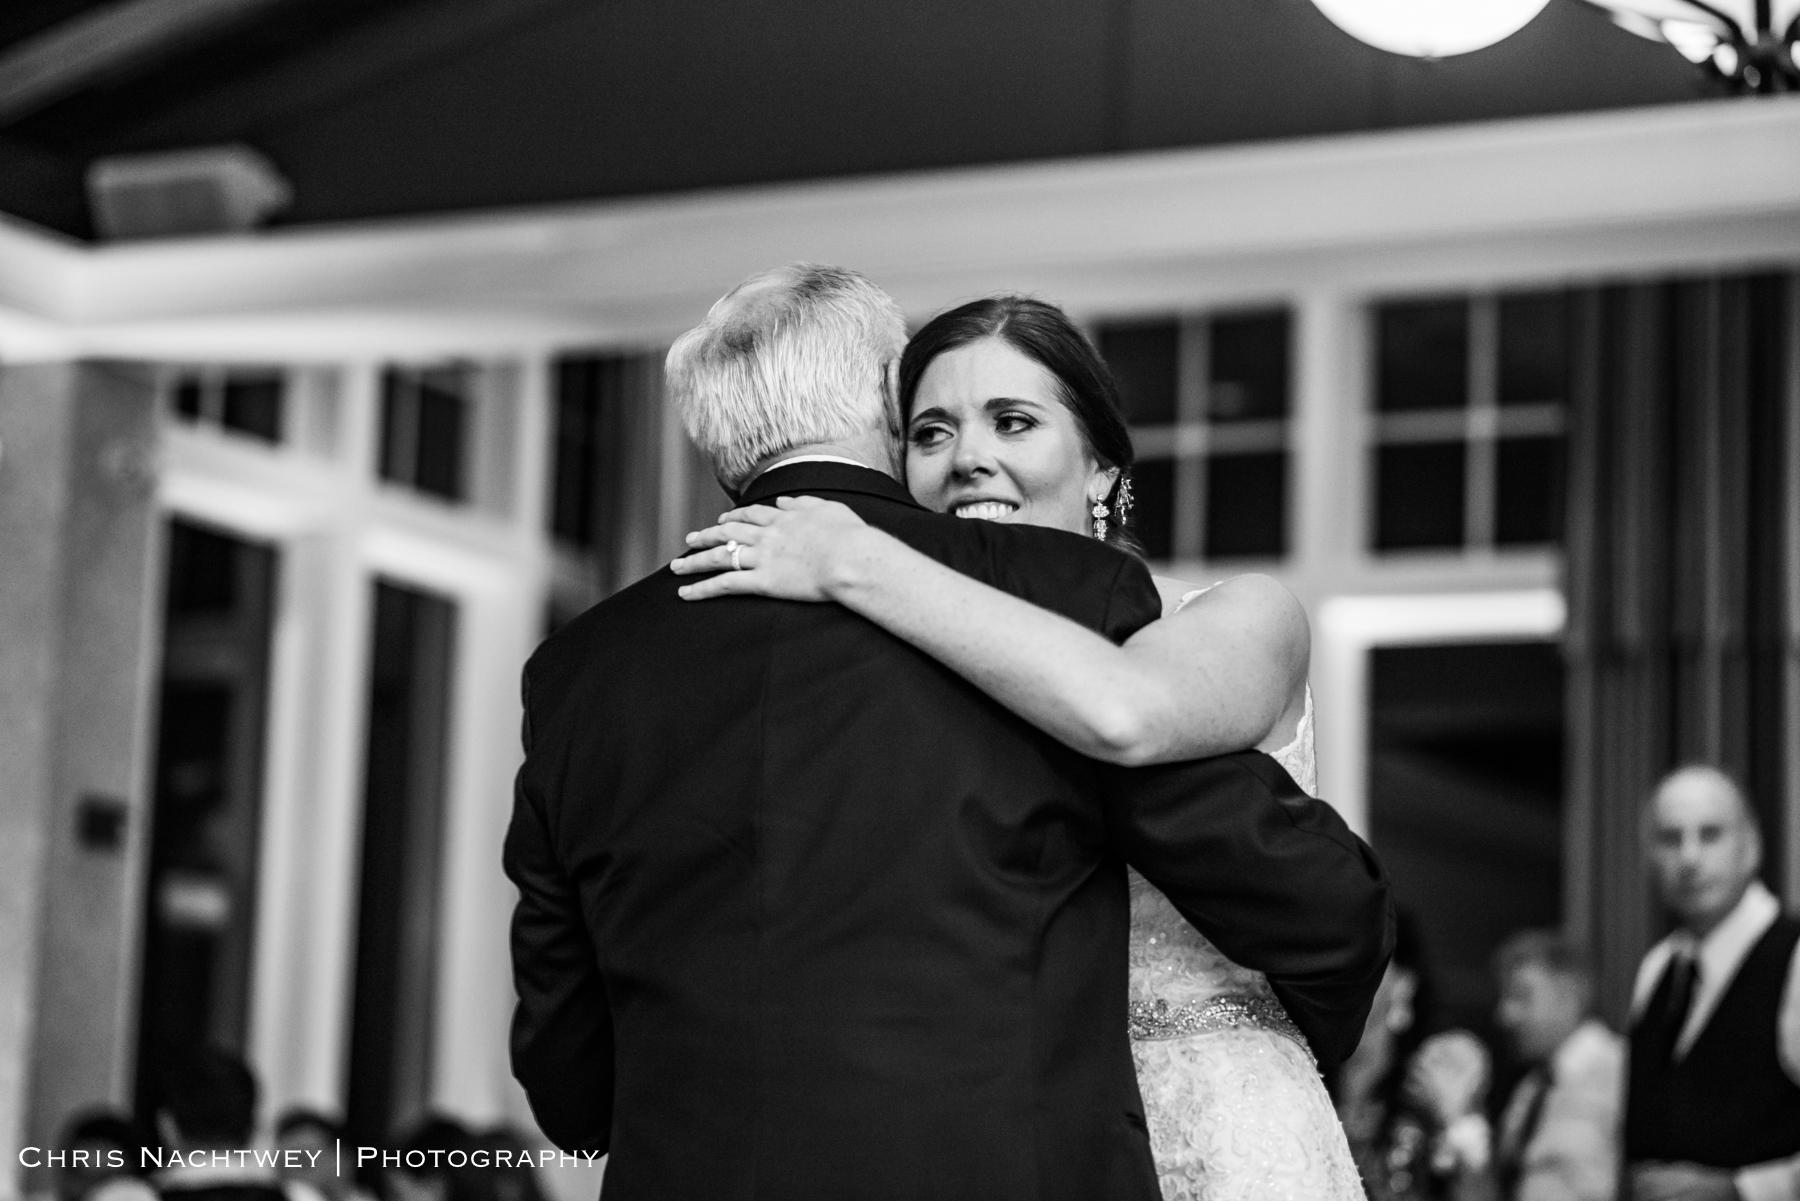 wedding-lake-of-isles-photos-chris-nachtwey-photography-2019-65.jpg